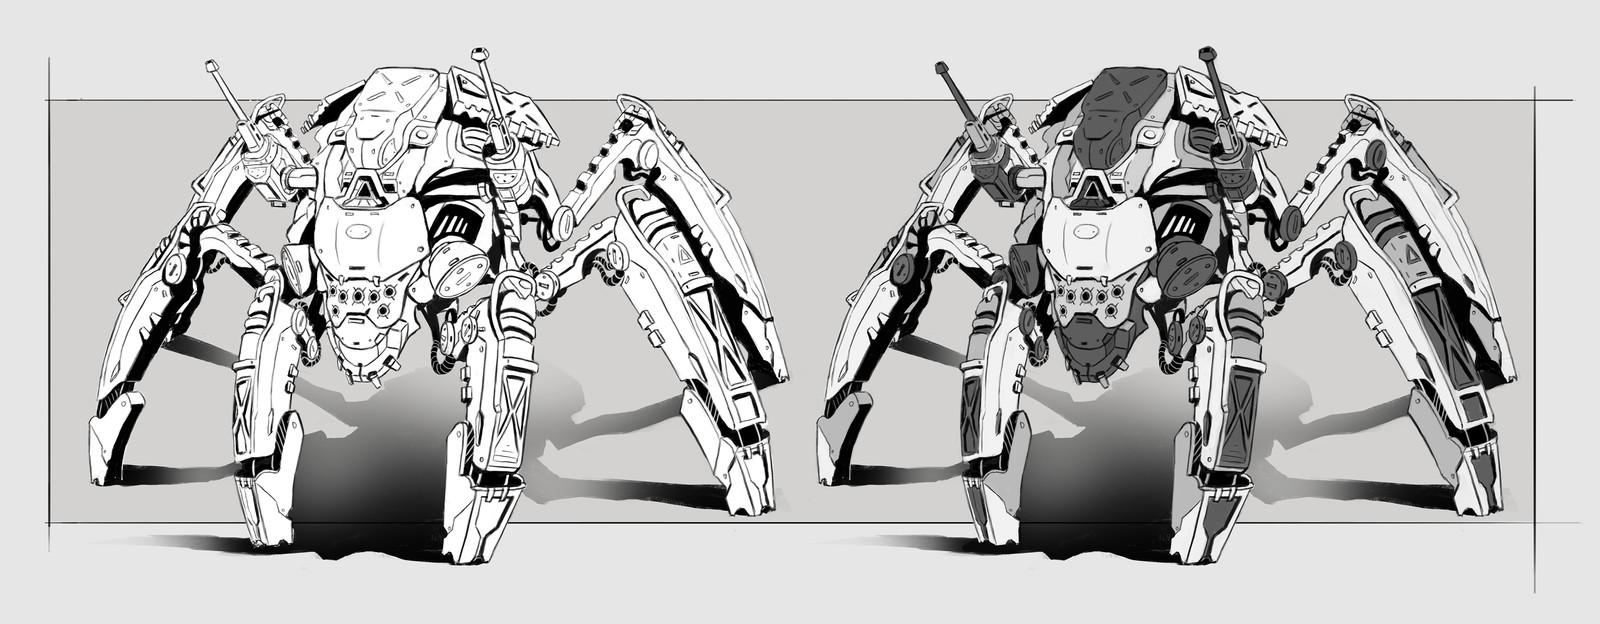 Feral Robots